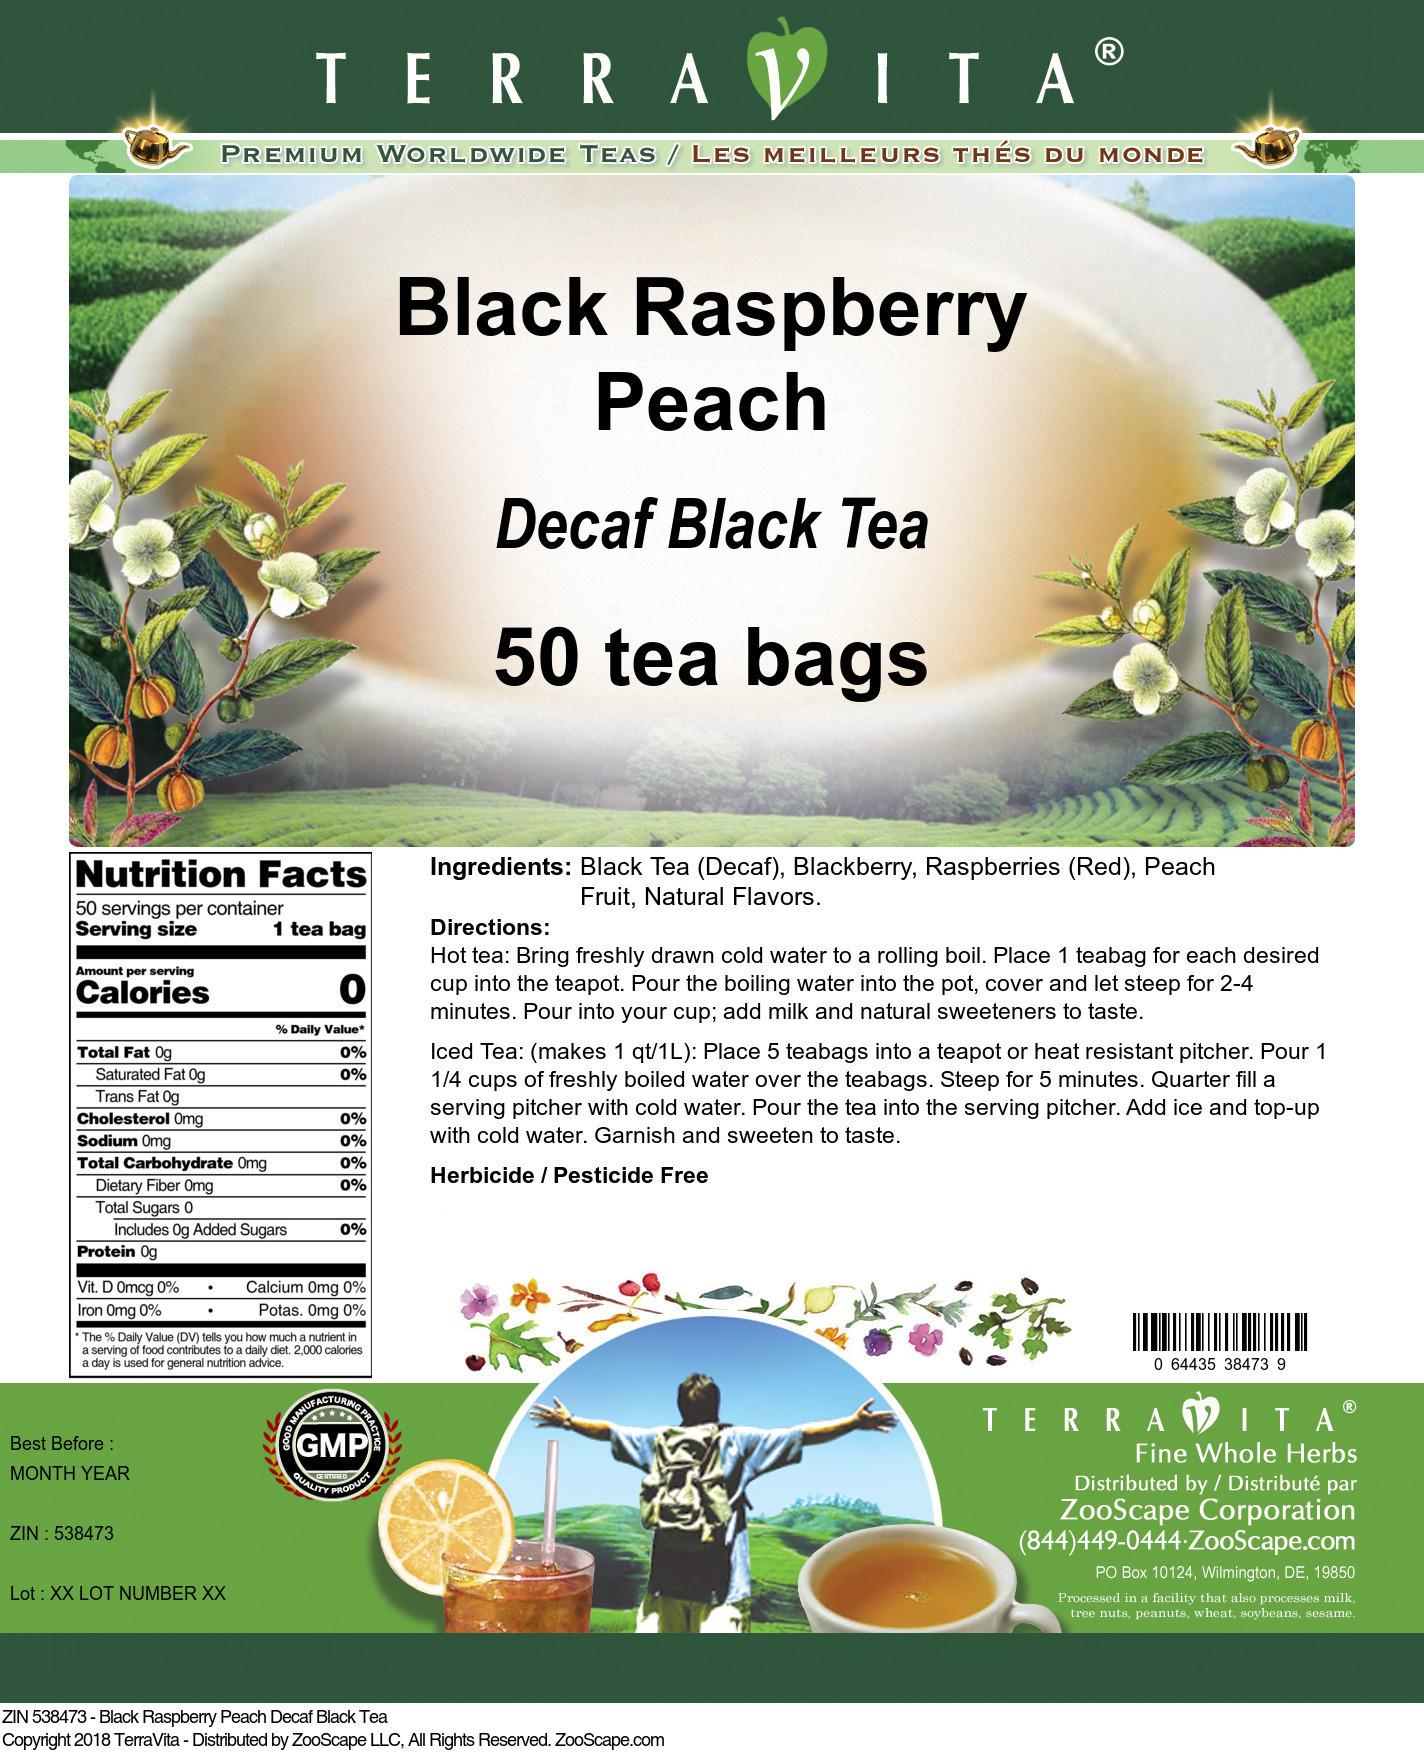 Black Raspberry Peach Decaf Black Tea